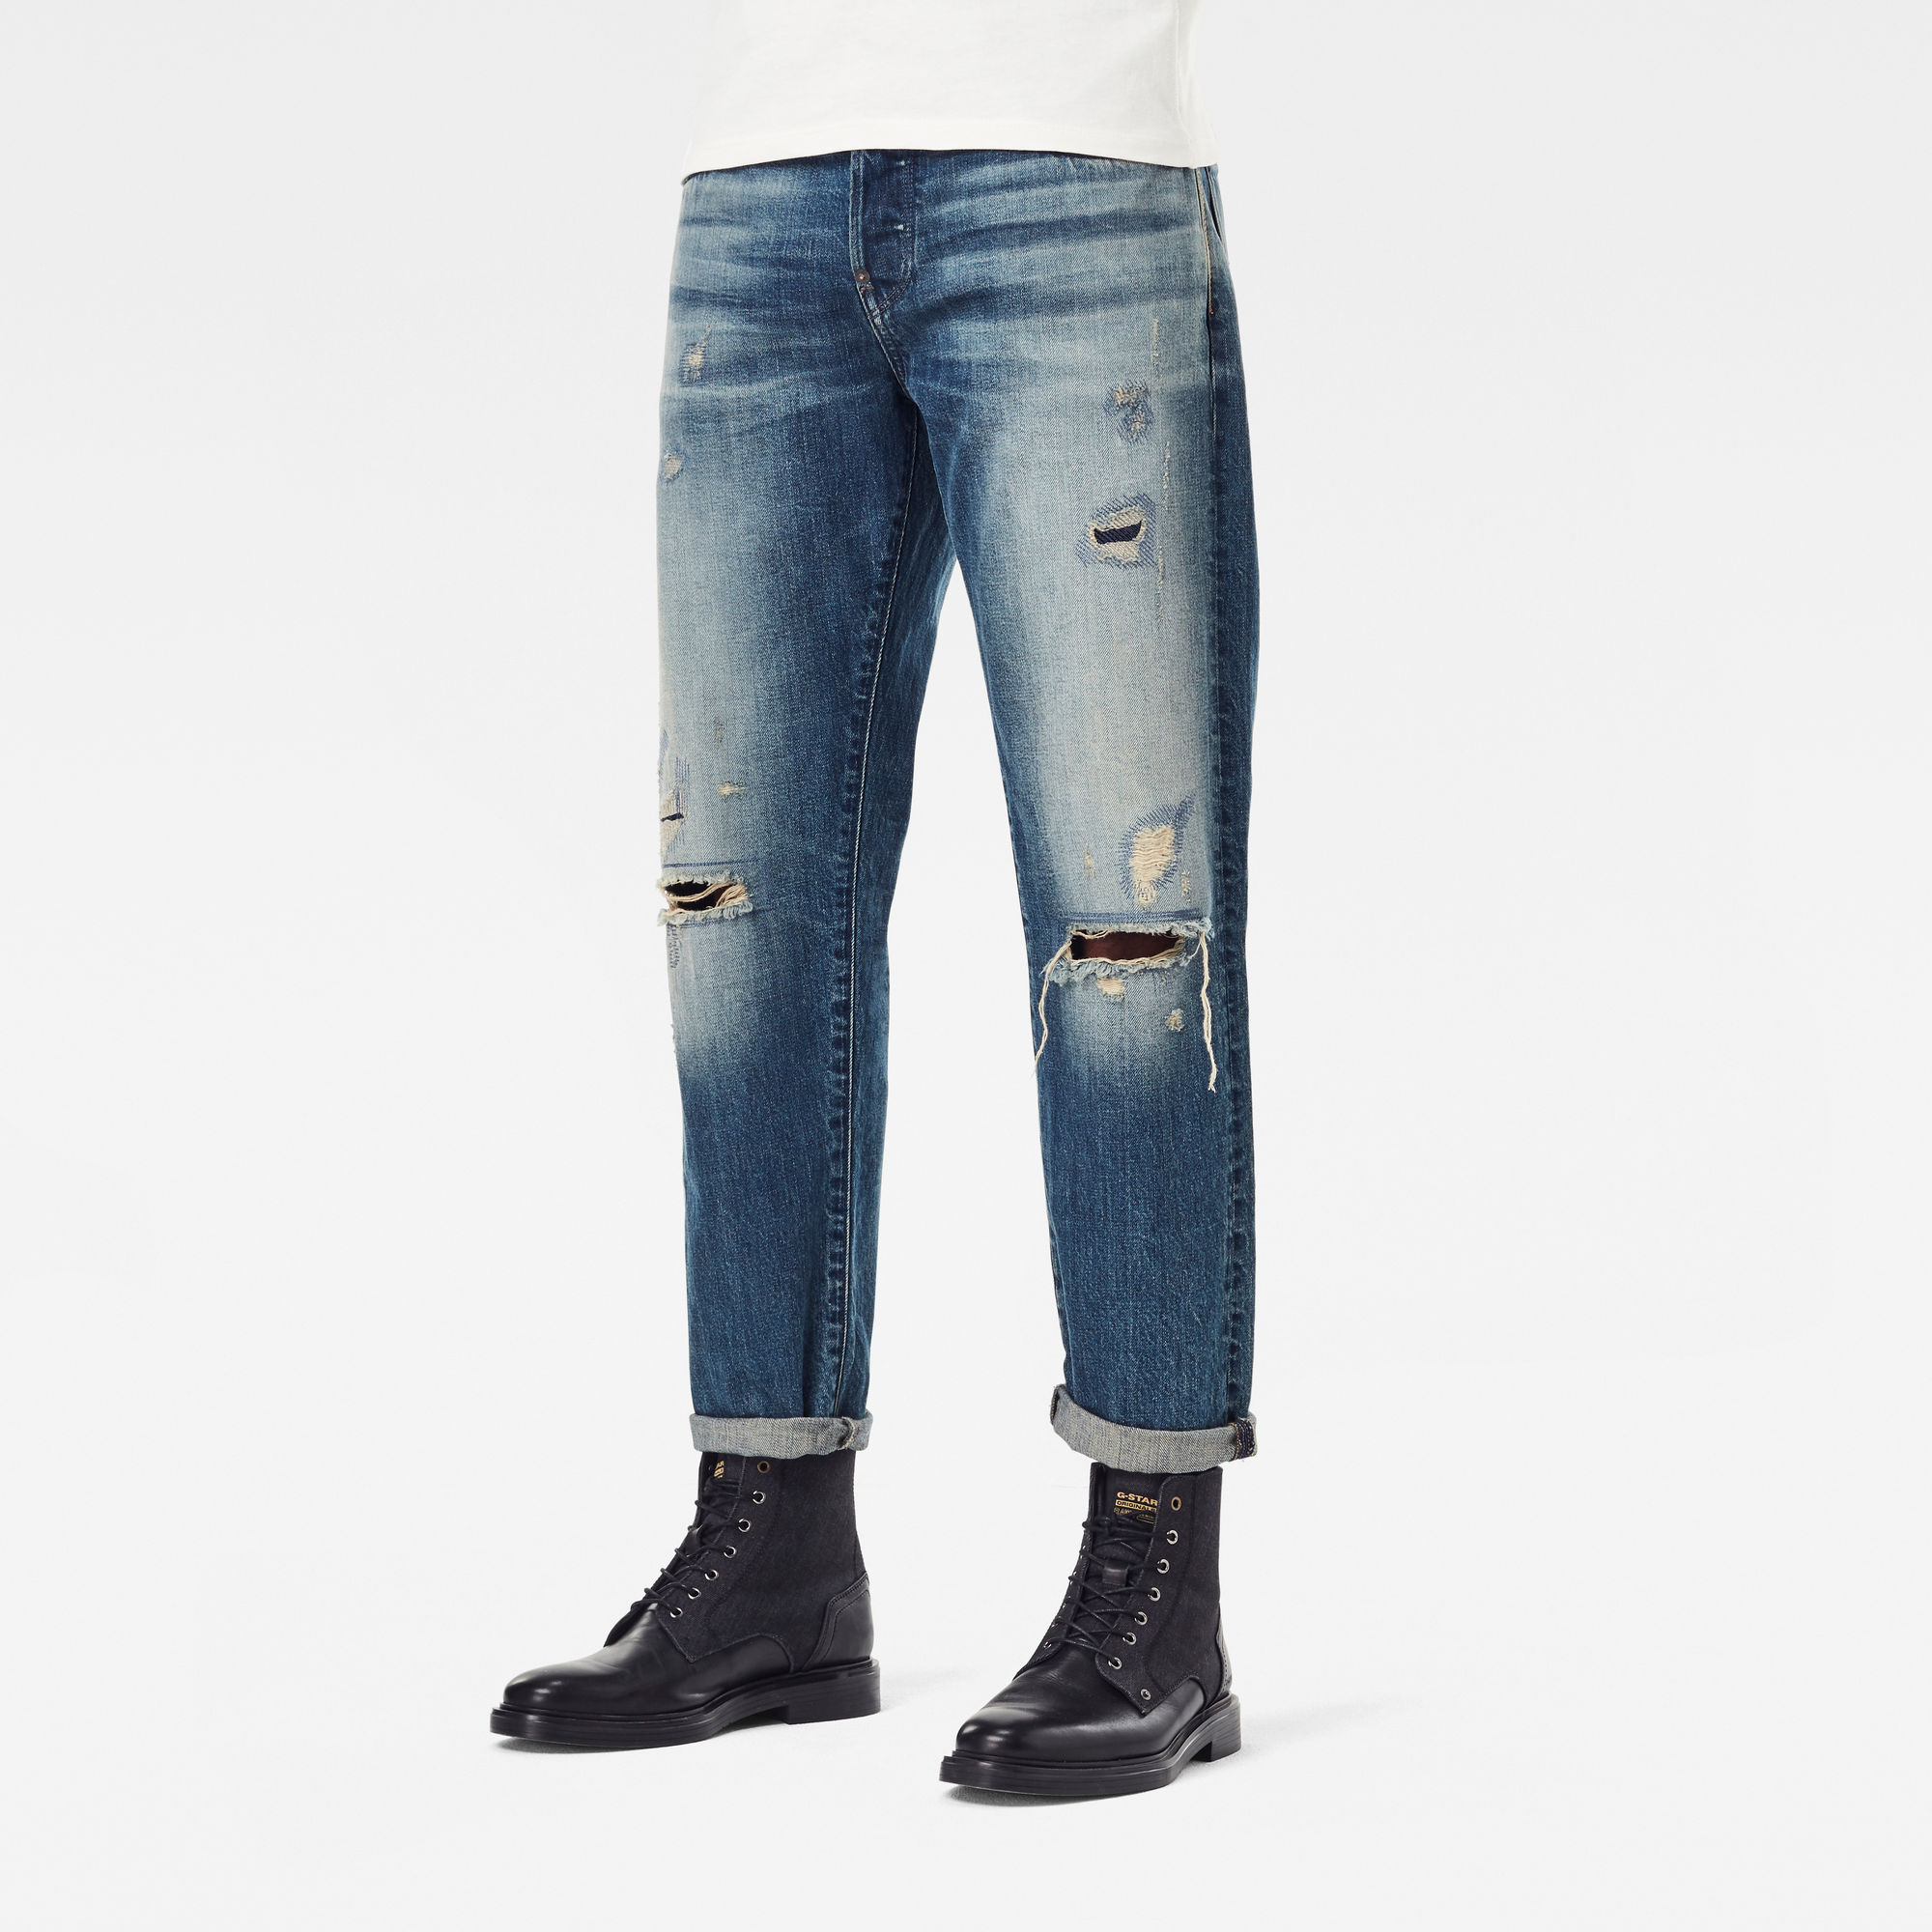 G-Star RAW Heren Alum Relaxed Tapered Originals 2 Jeans Blauw